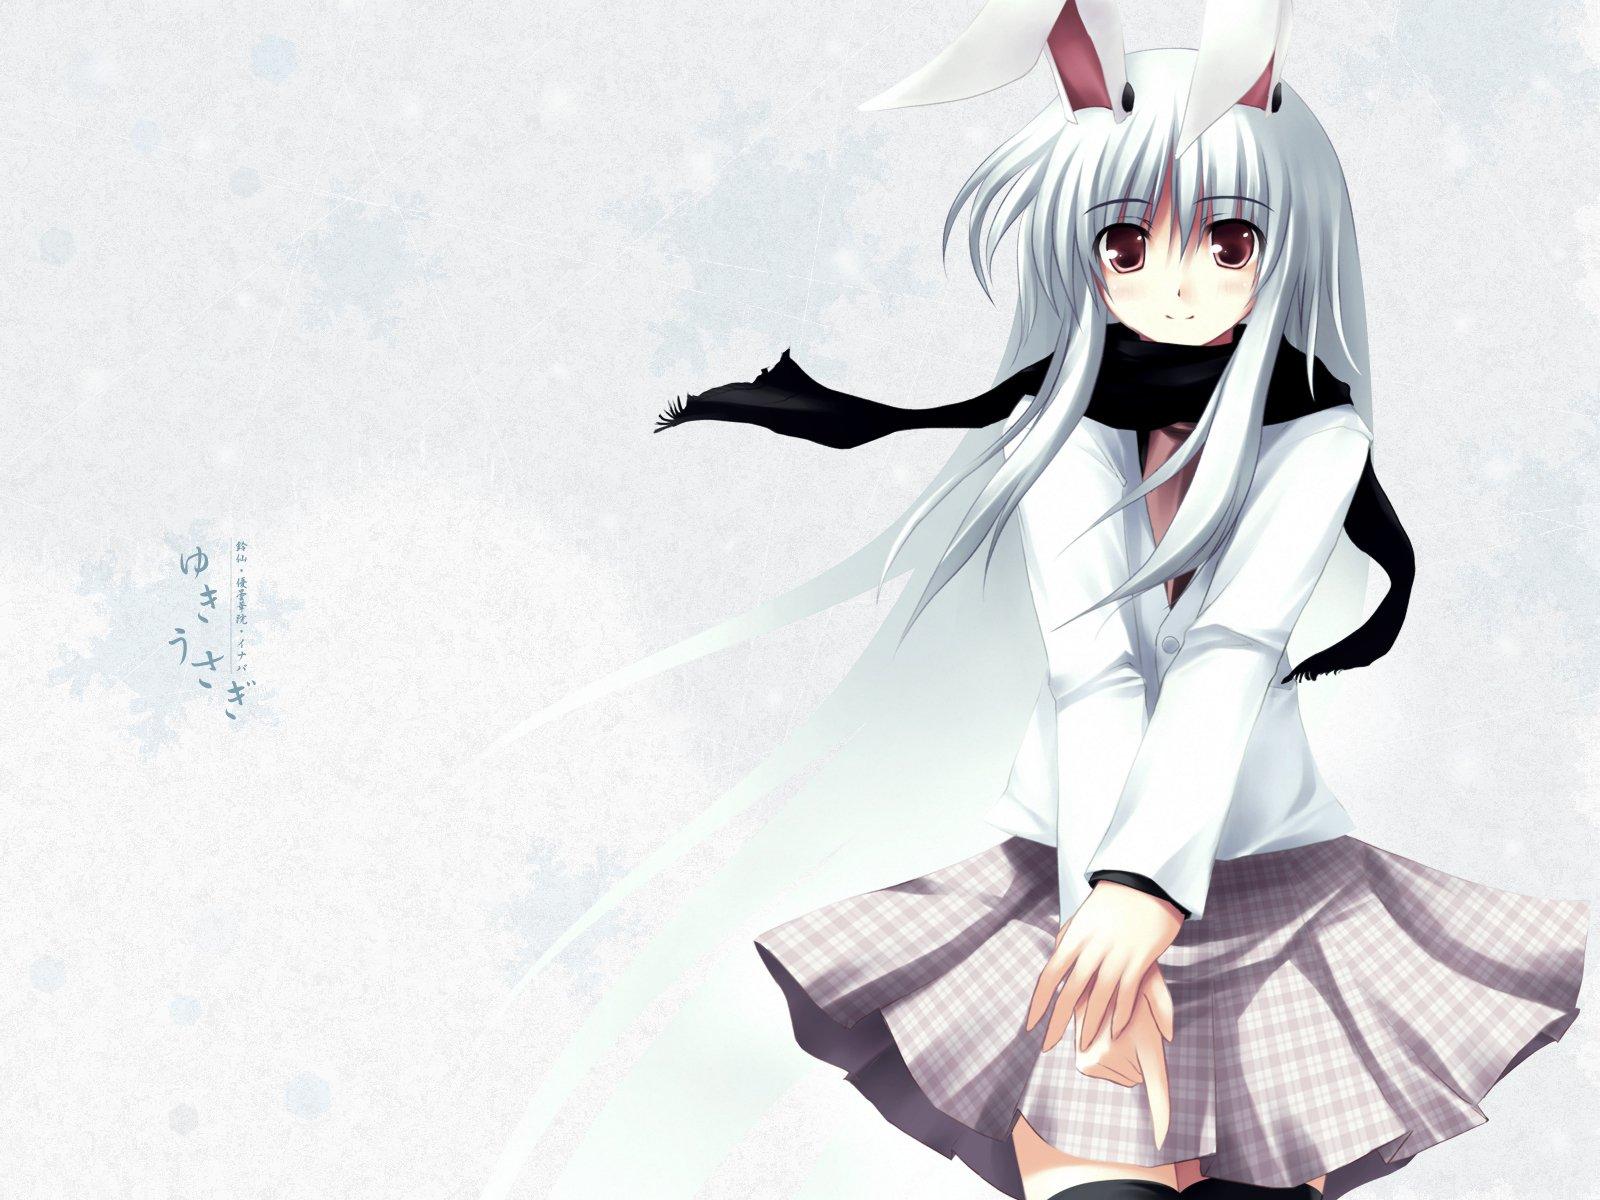 Anime - Flicka  Reisen Udongein Inaba Bakgrund